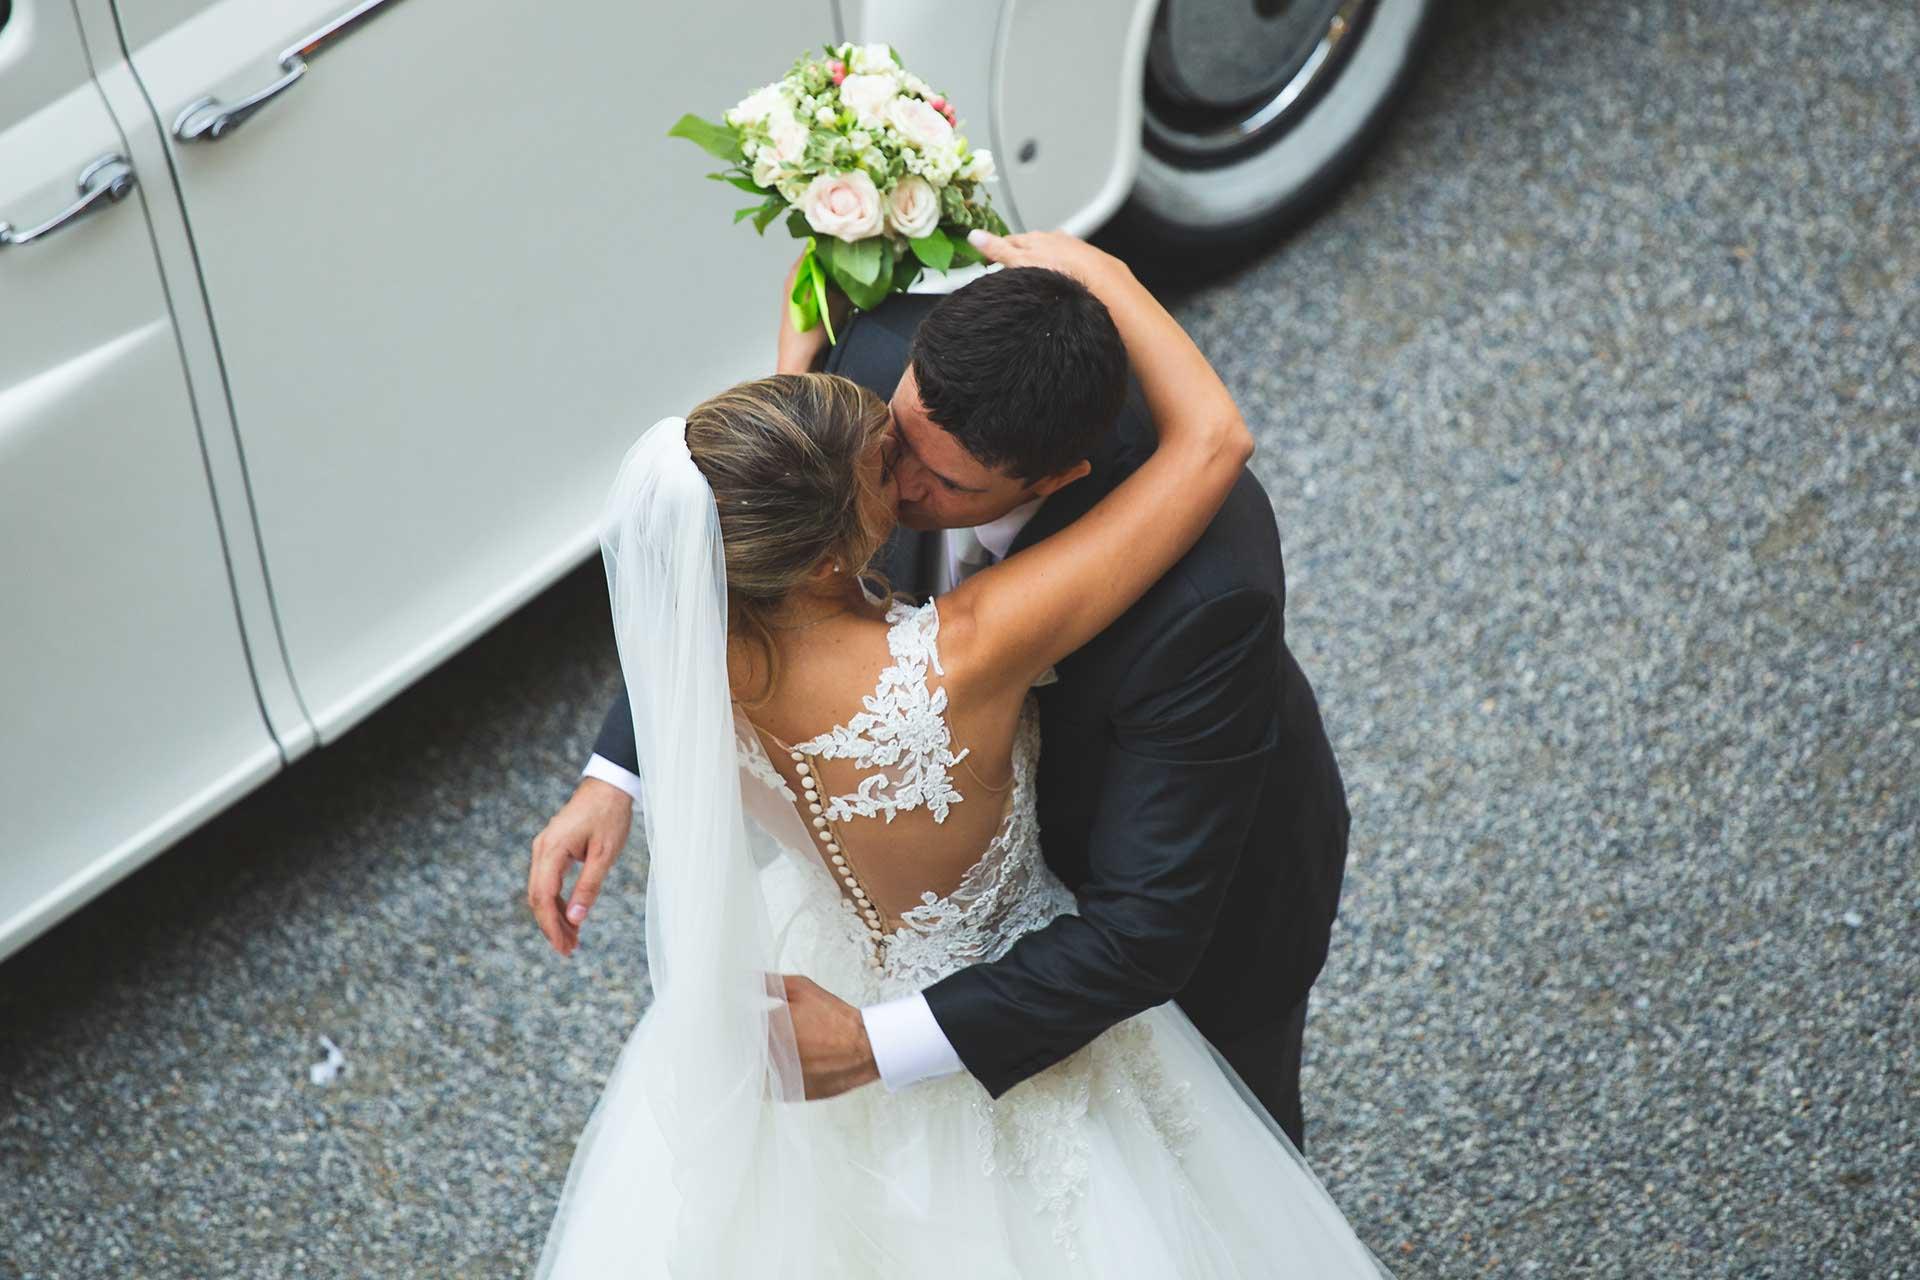 sposi bacio auto bouquet